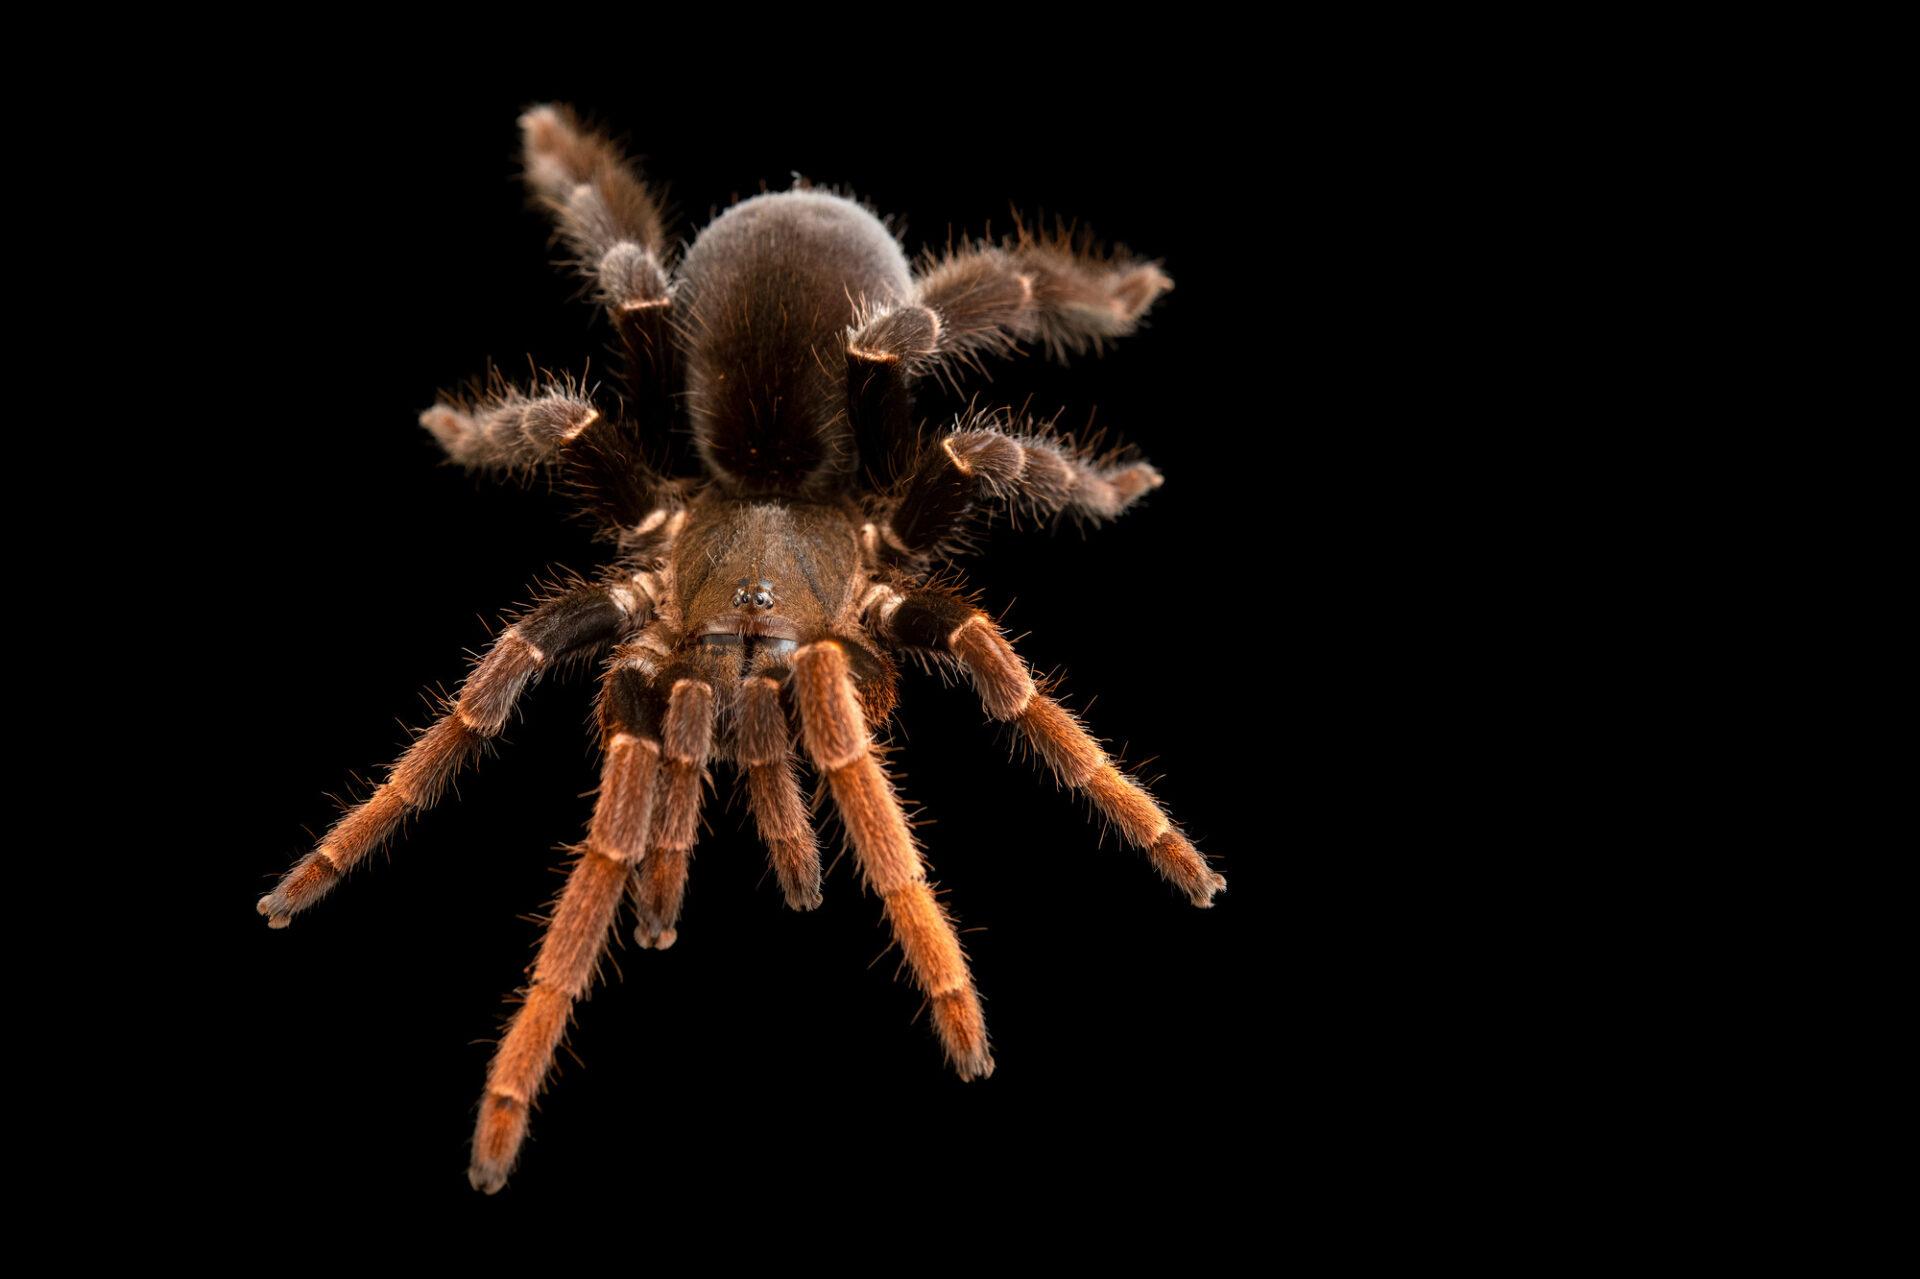 Photo: A tarantula (Lyrognathus giannisposatoi) from a private collection.